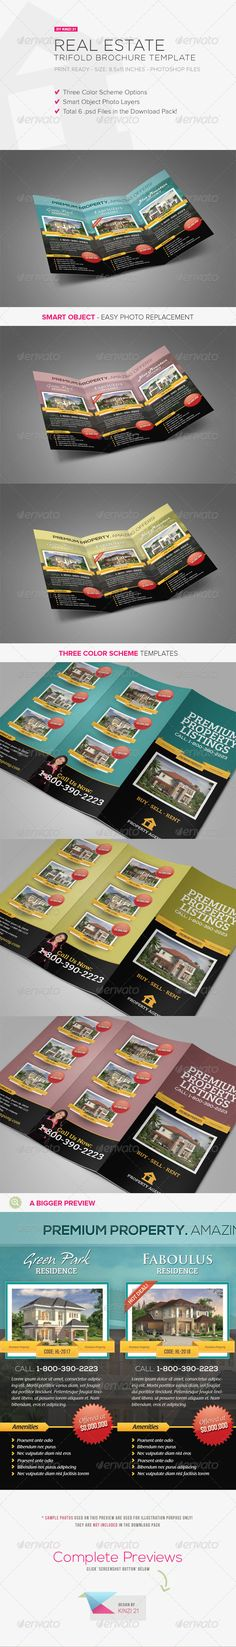 Real Estate Trifold Brochure Brochures, Brochure template and - real estate brochure template